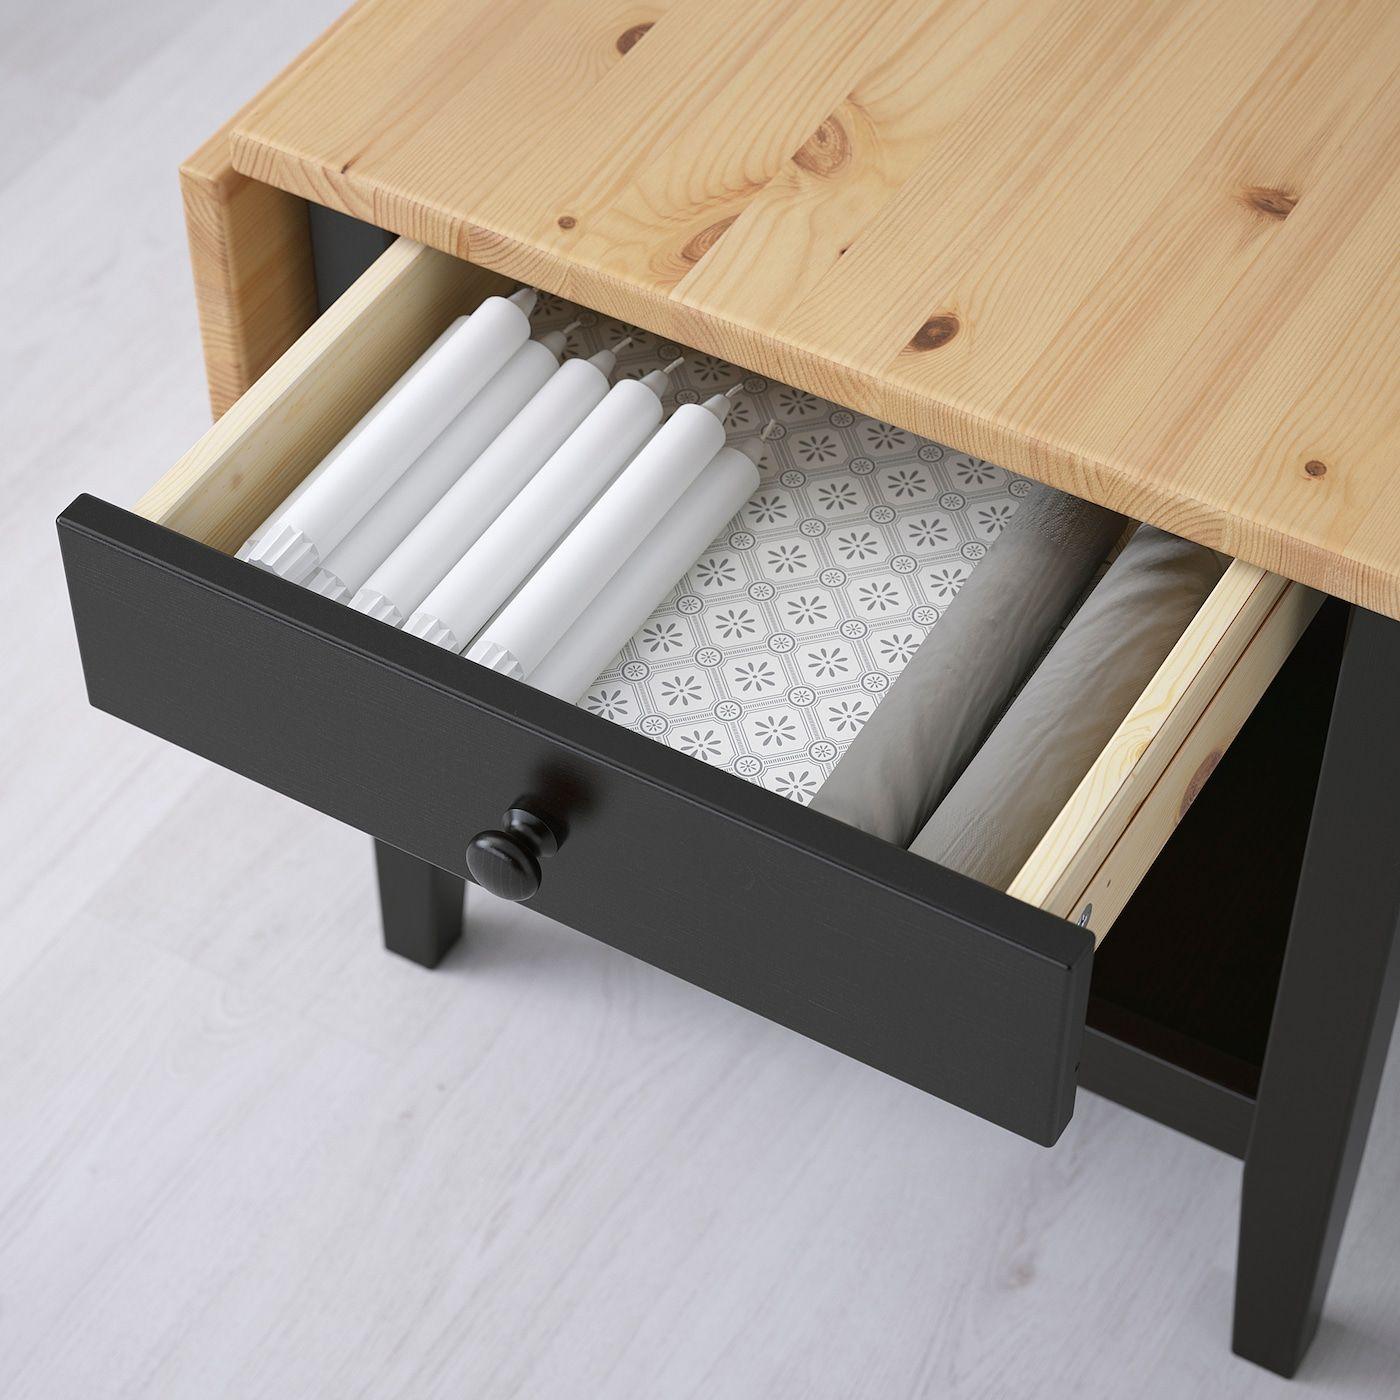 Arkelstorp Coffee Table Black Ikea Coffee Table Wood Ikea Lack Table Ikea [ 1400 x 1400 Pixel ]